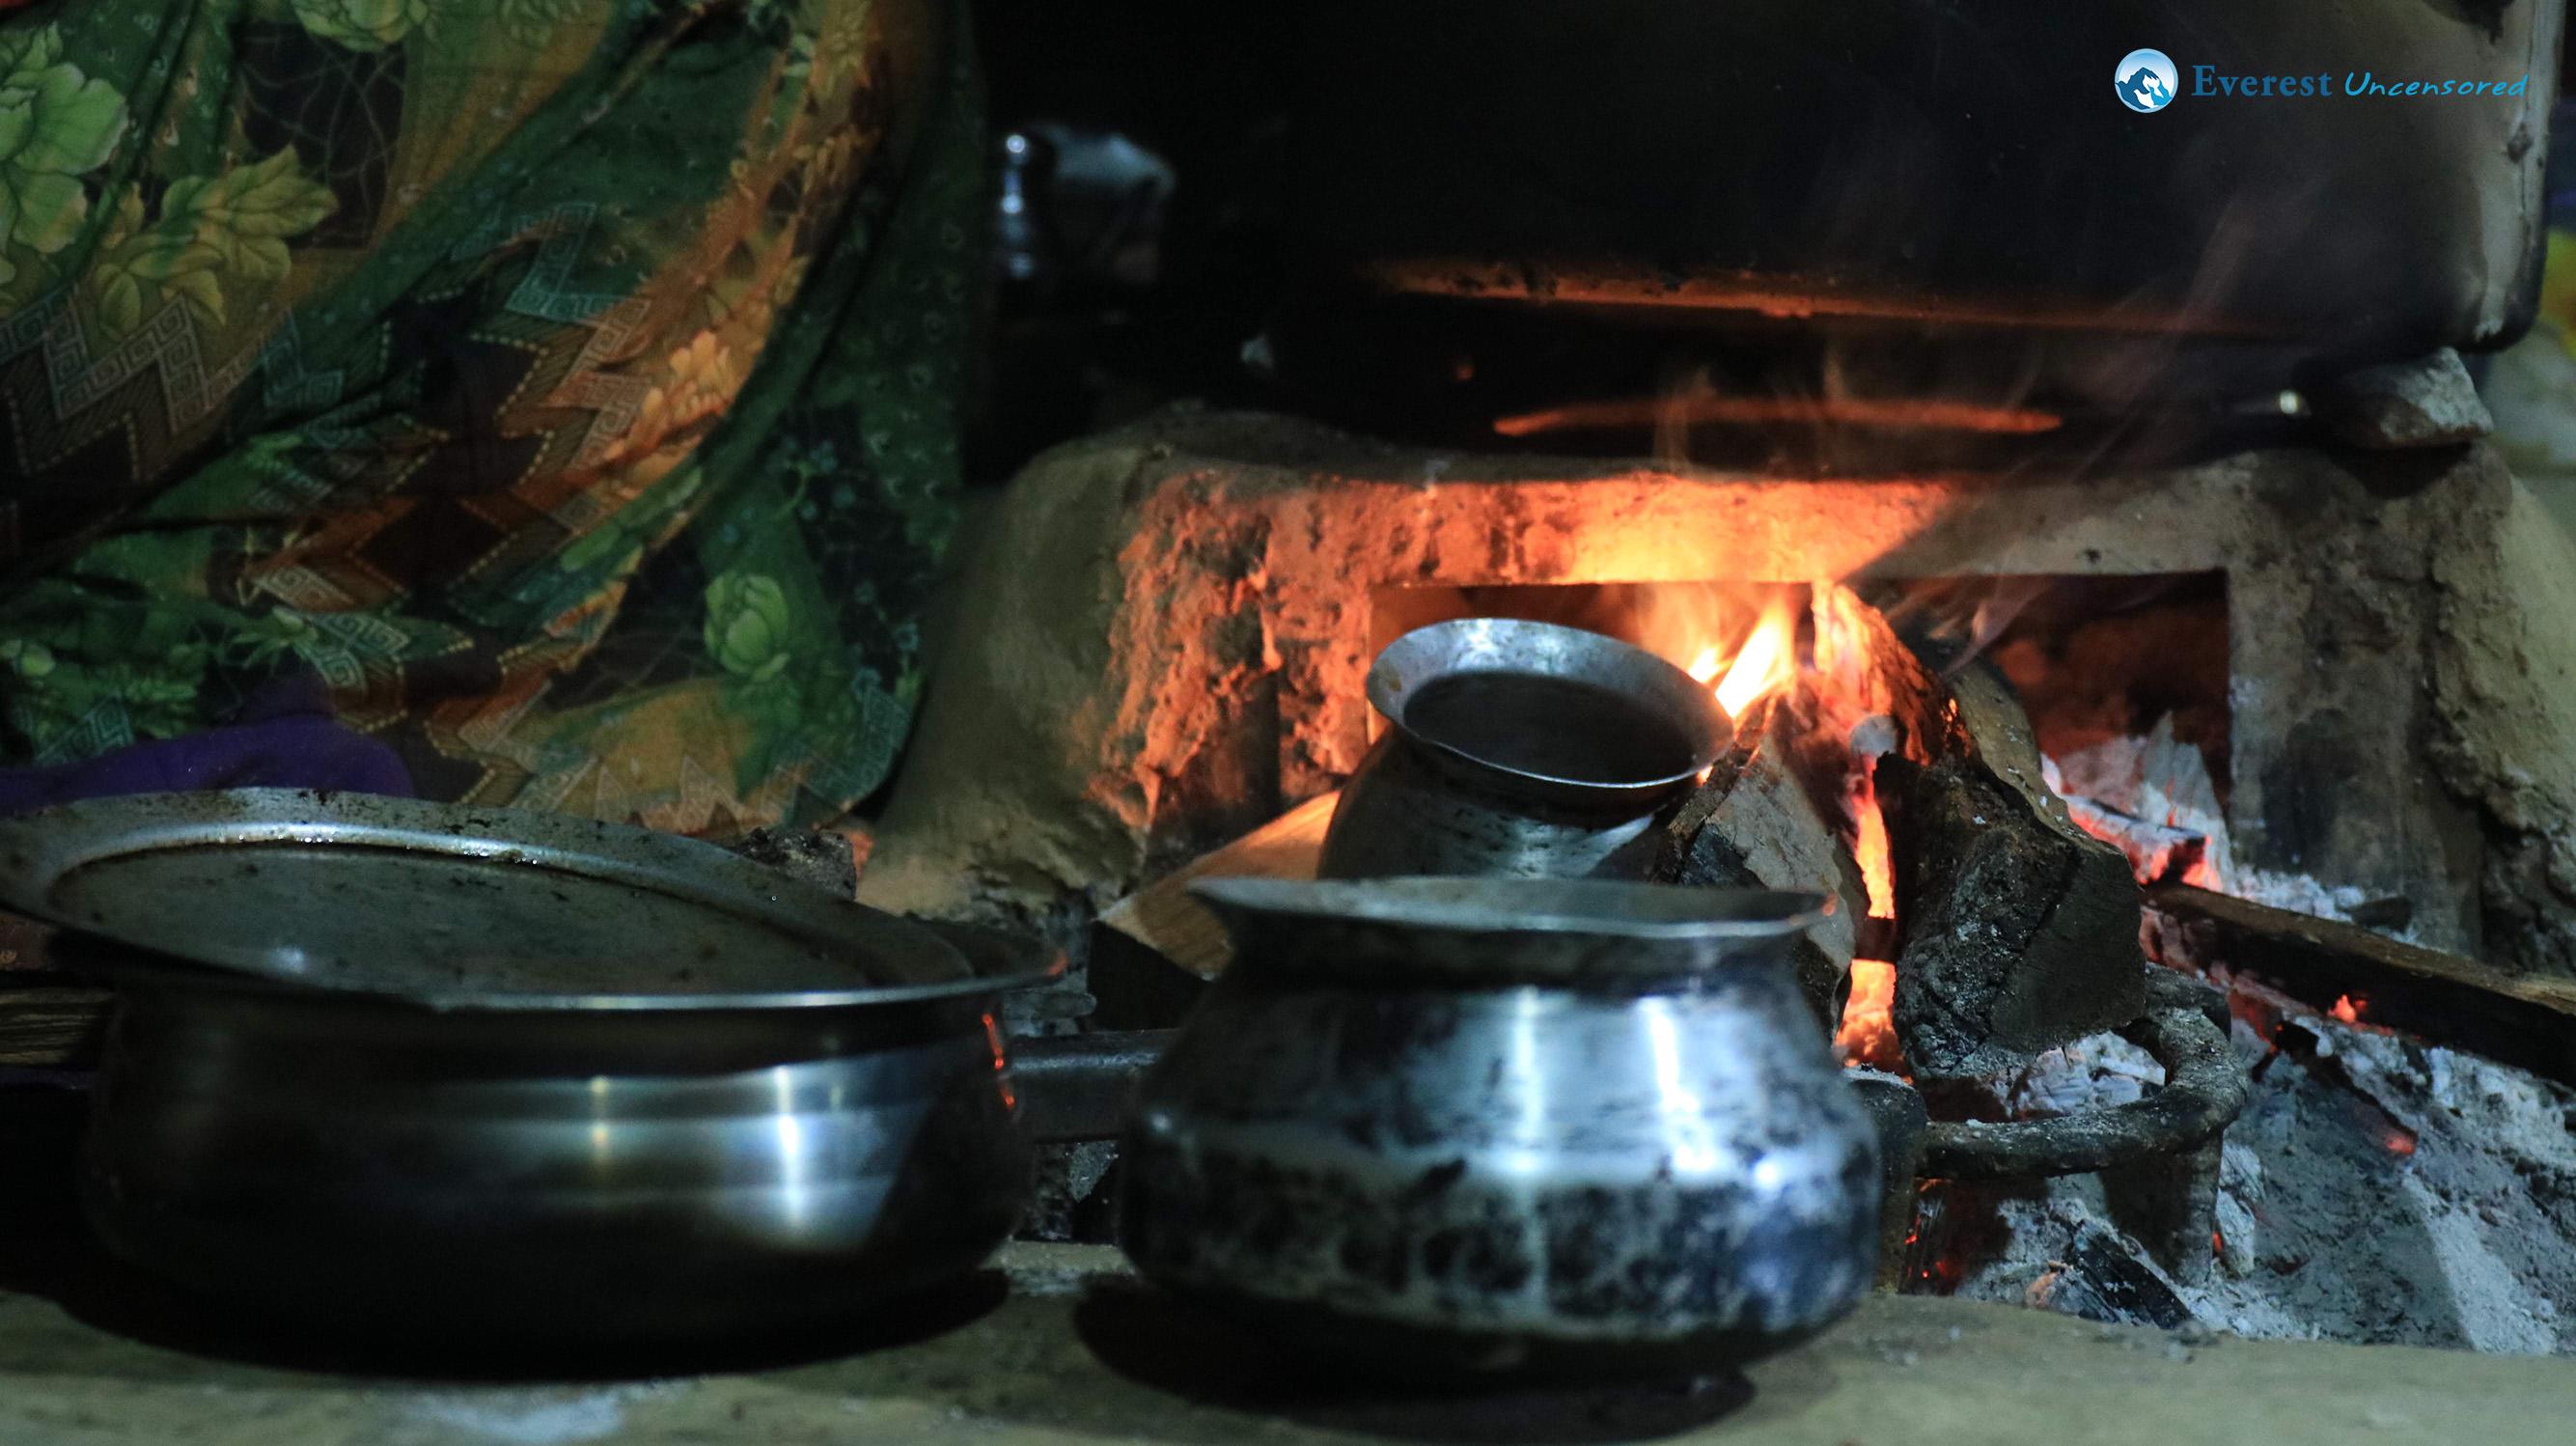 7.typical Nepali